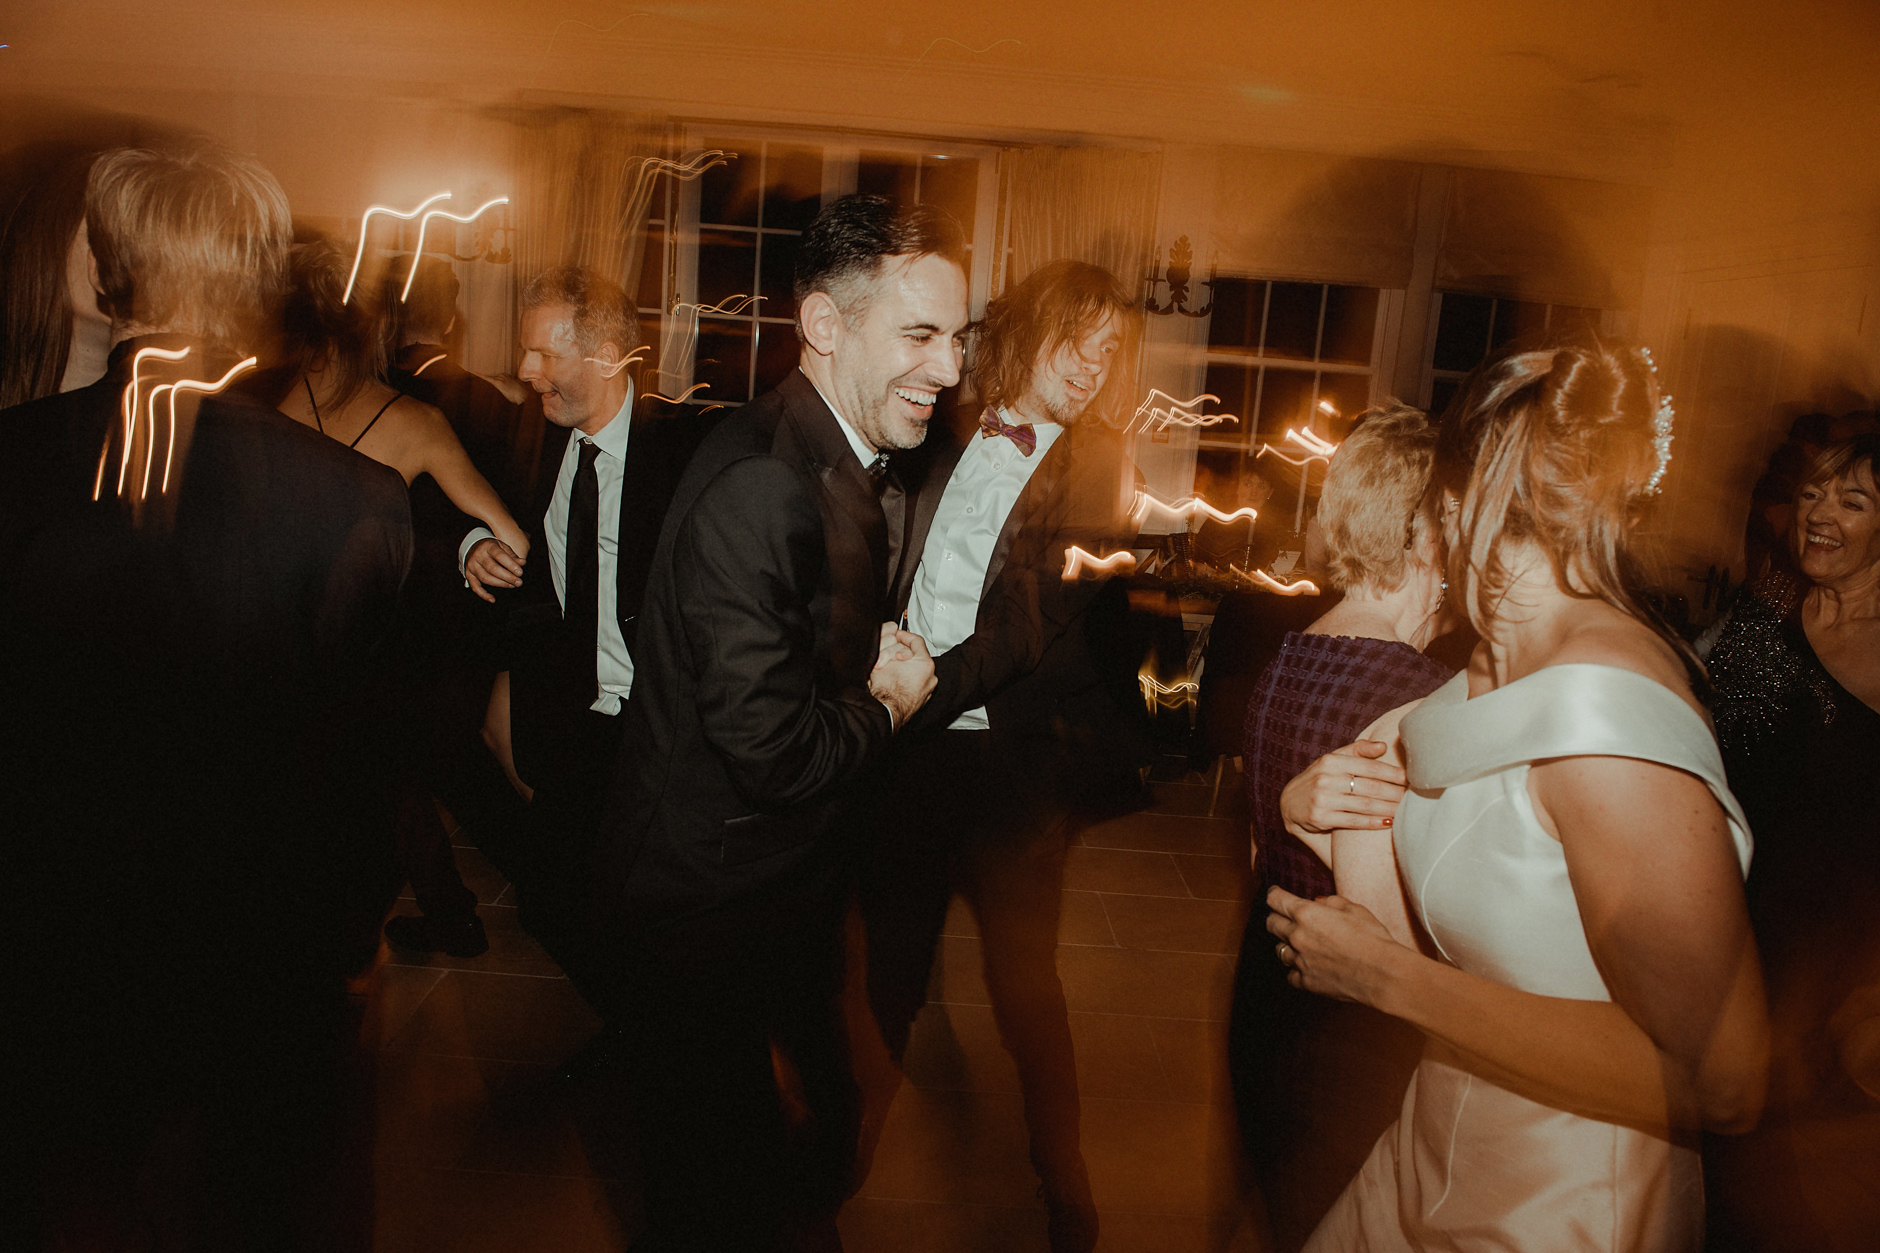 Glentruim-Wedding-Nikki-Leadbetter-Photography-402.jpg